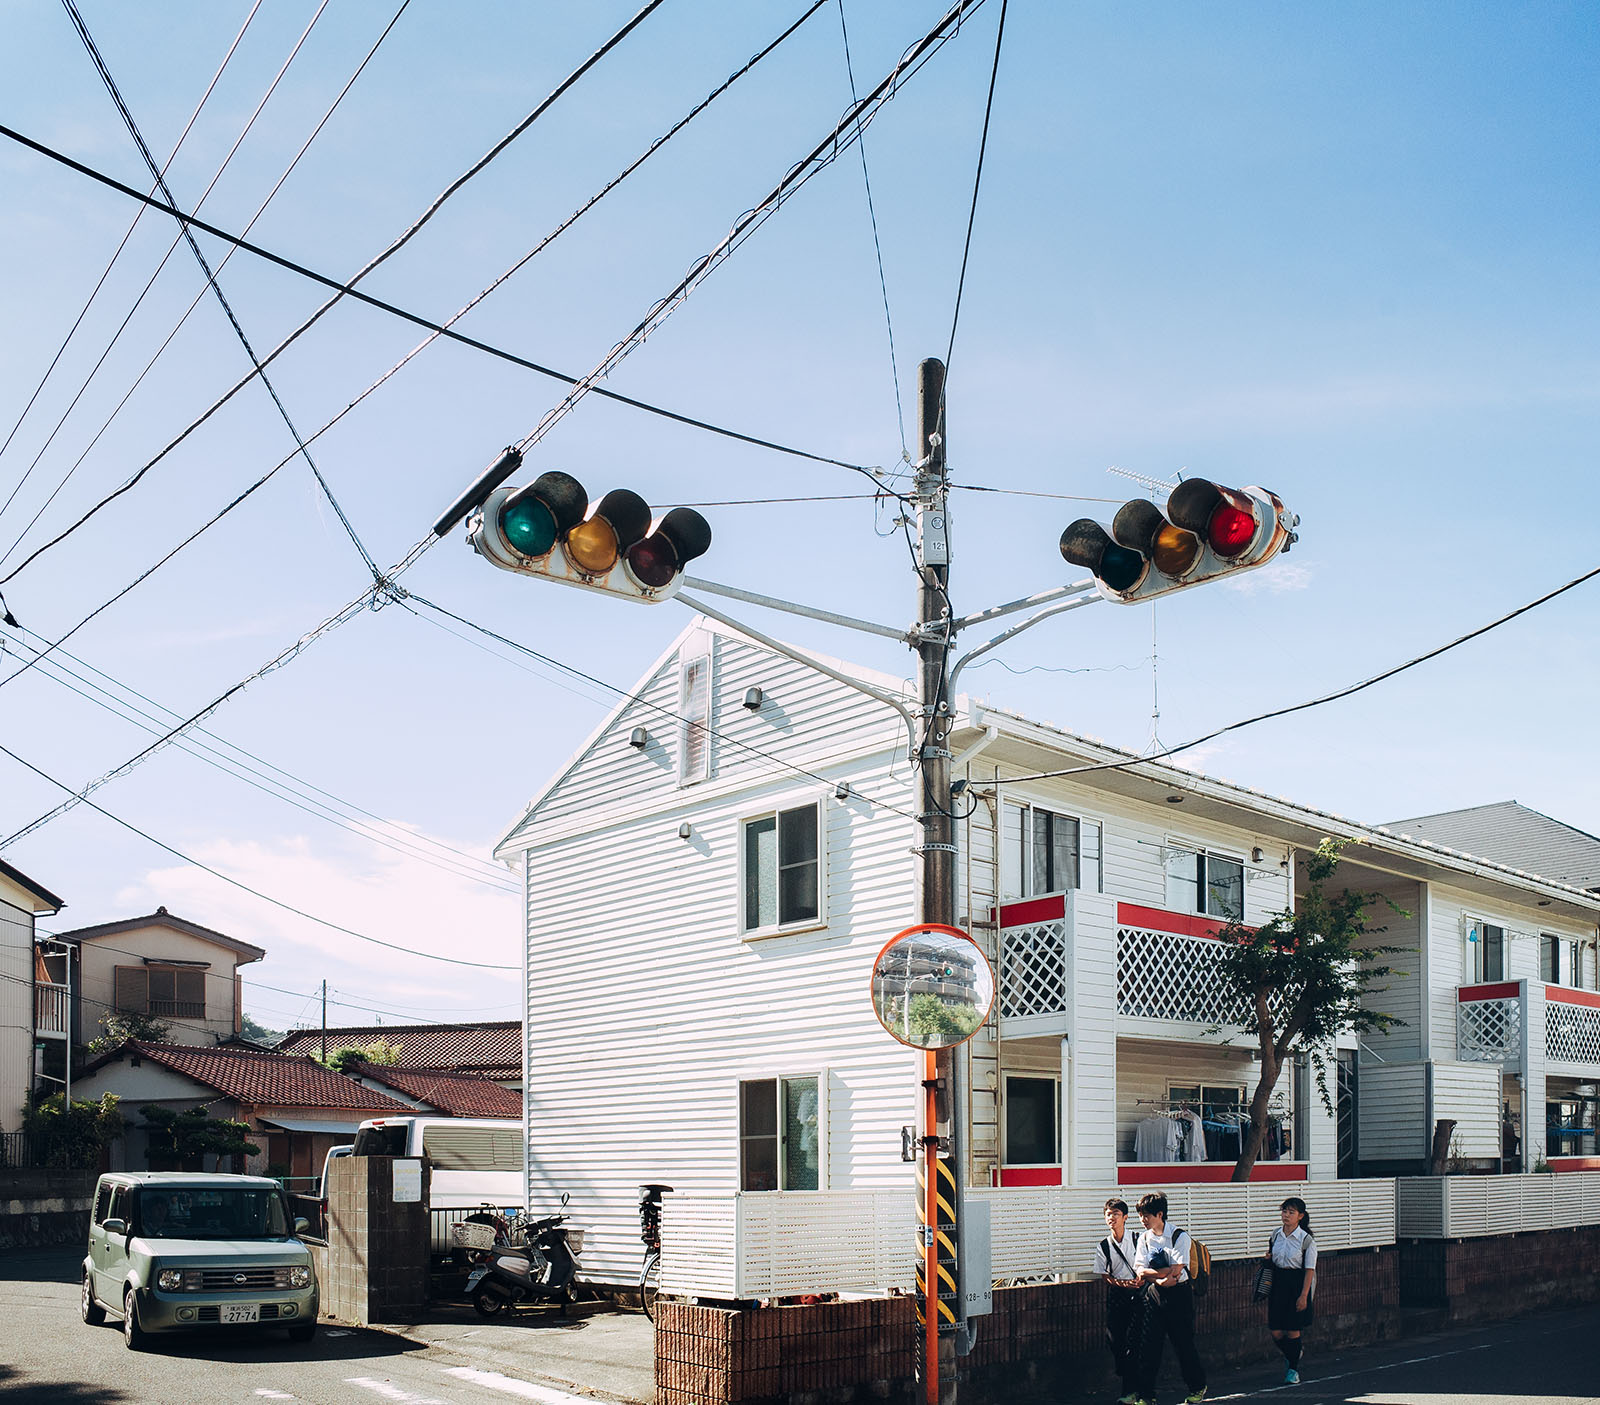 「Ricoh GR 攝影美學」拍出輕便相機的極致影像,第二階段課程上架